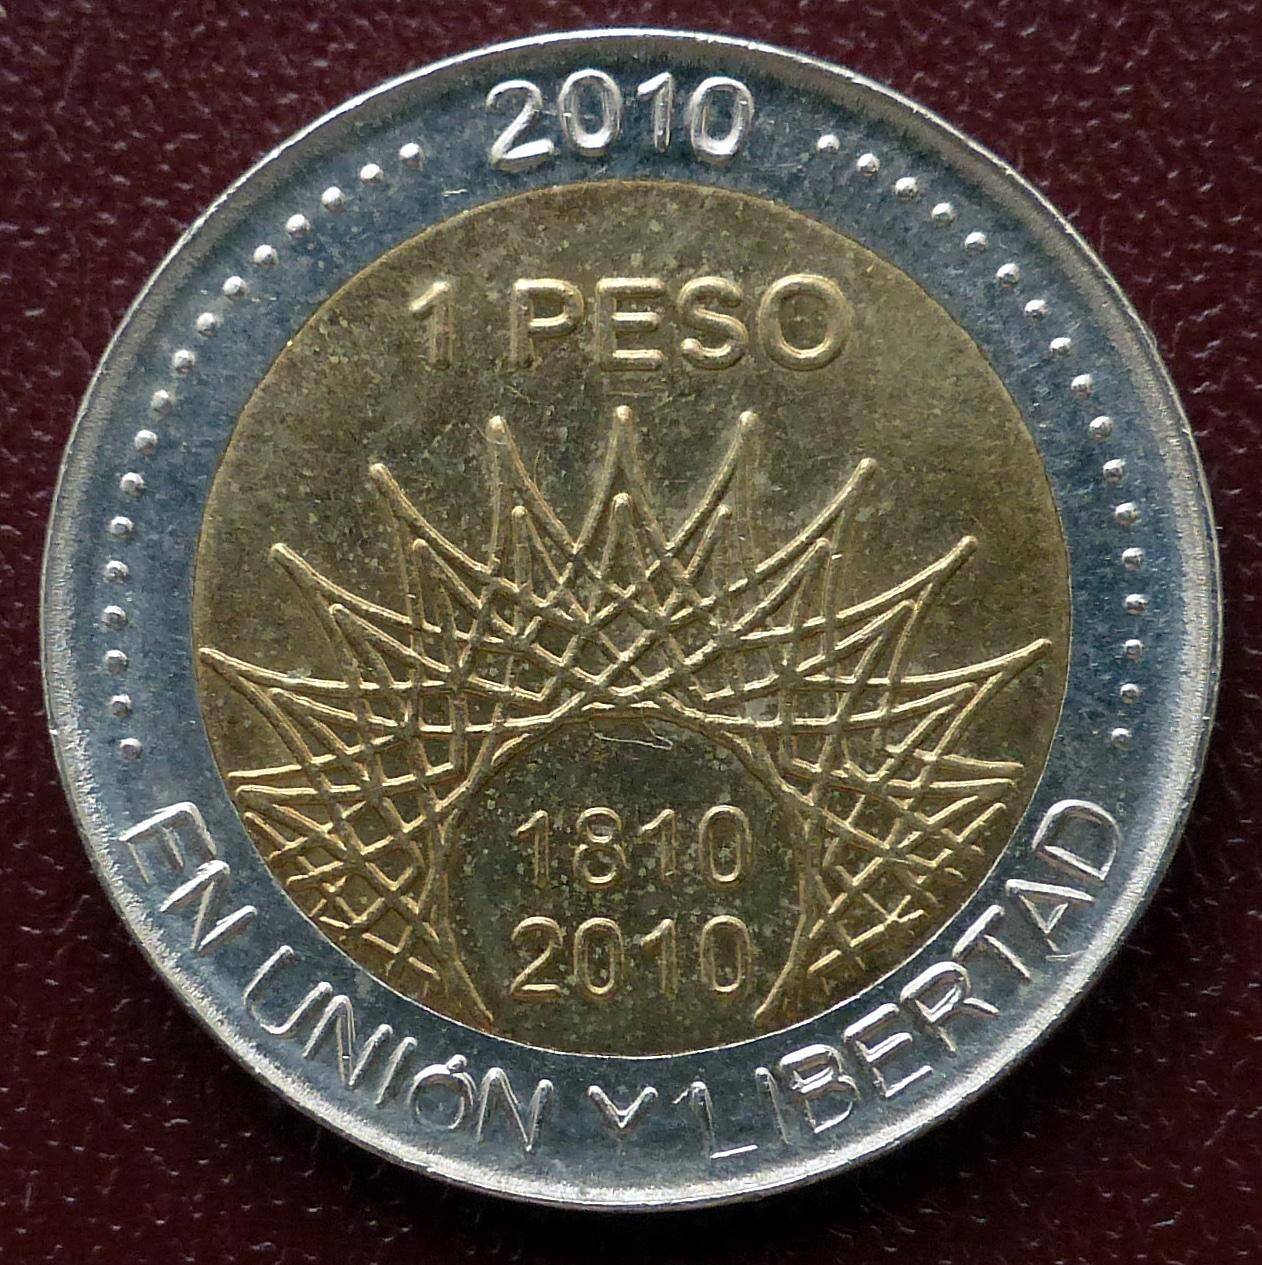 Argentina - Serie 1 peso - Bicentenario 1anv